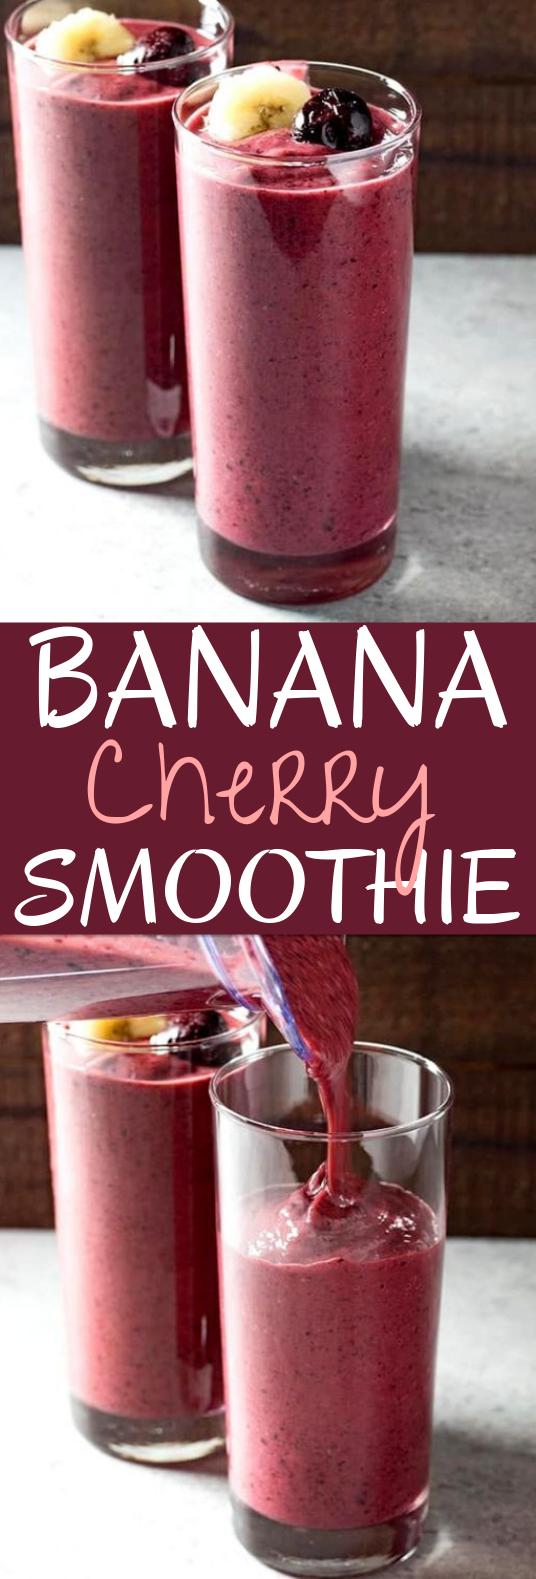 Banana Cherry Smoothie #drinks #smoothies